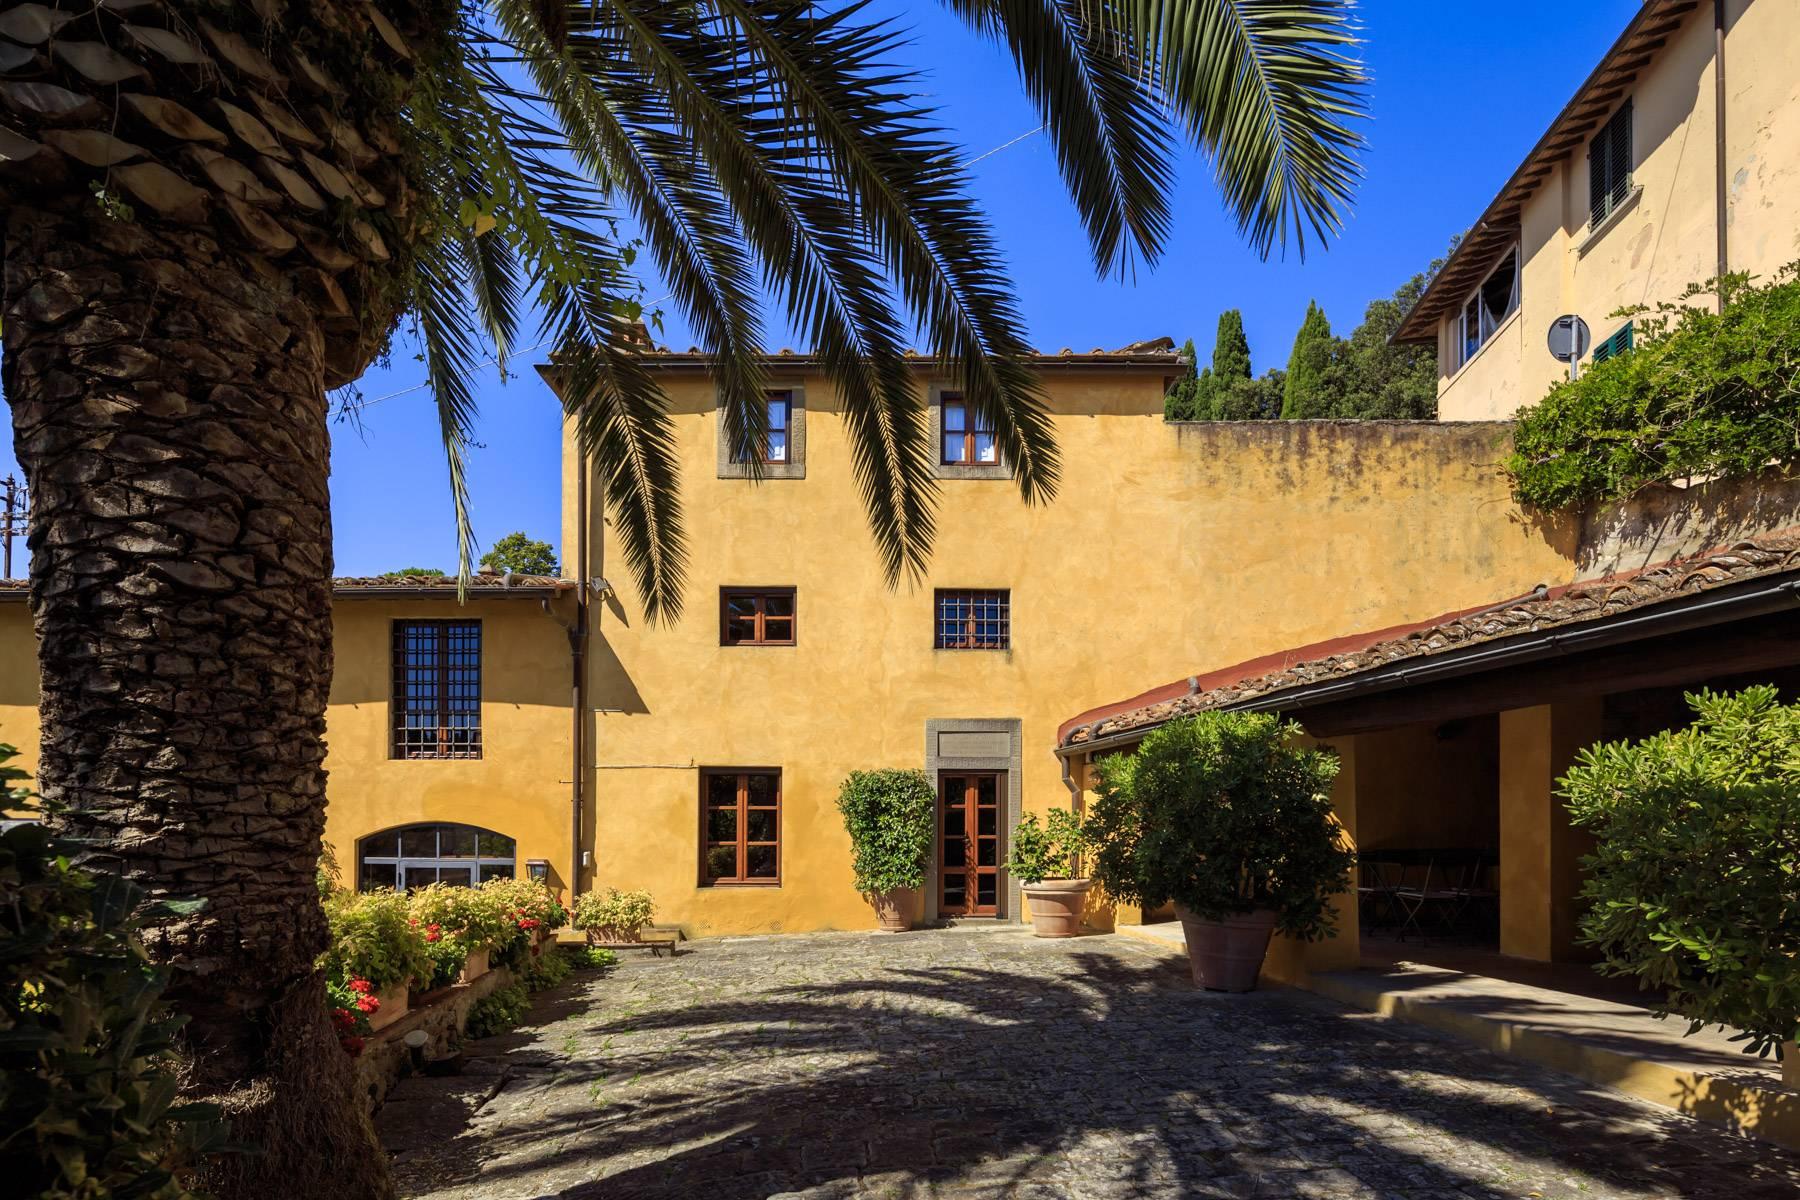 Villa in Affitto a Firenze: 5 locali, 600 mq - Foto 16